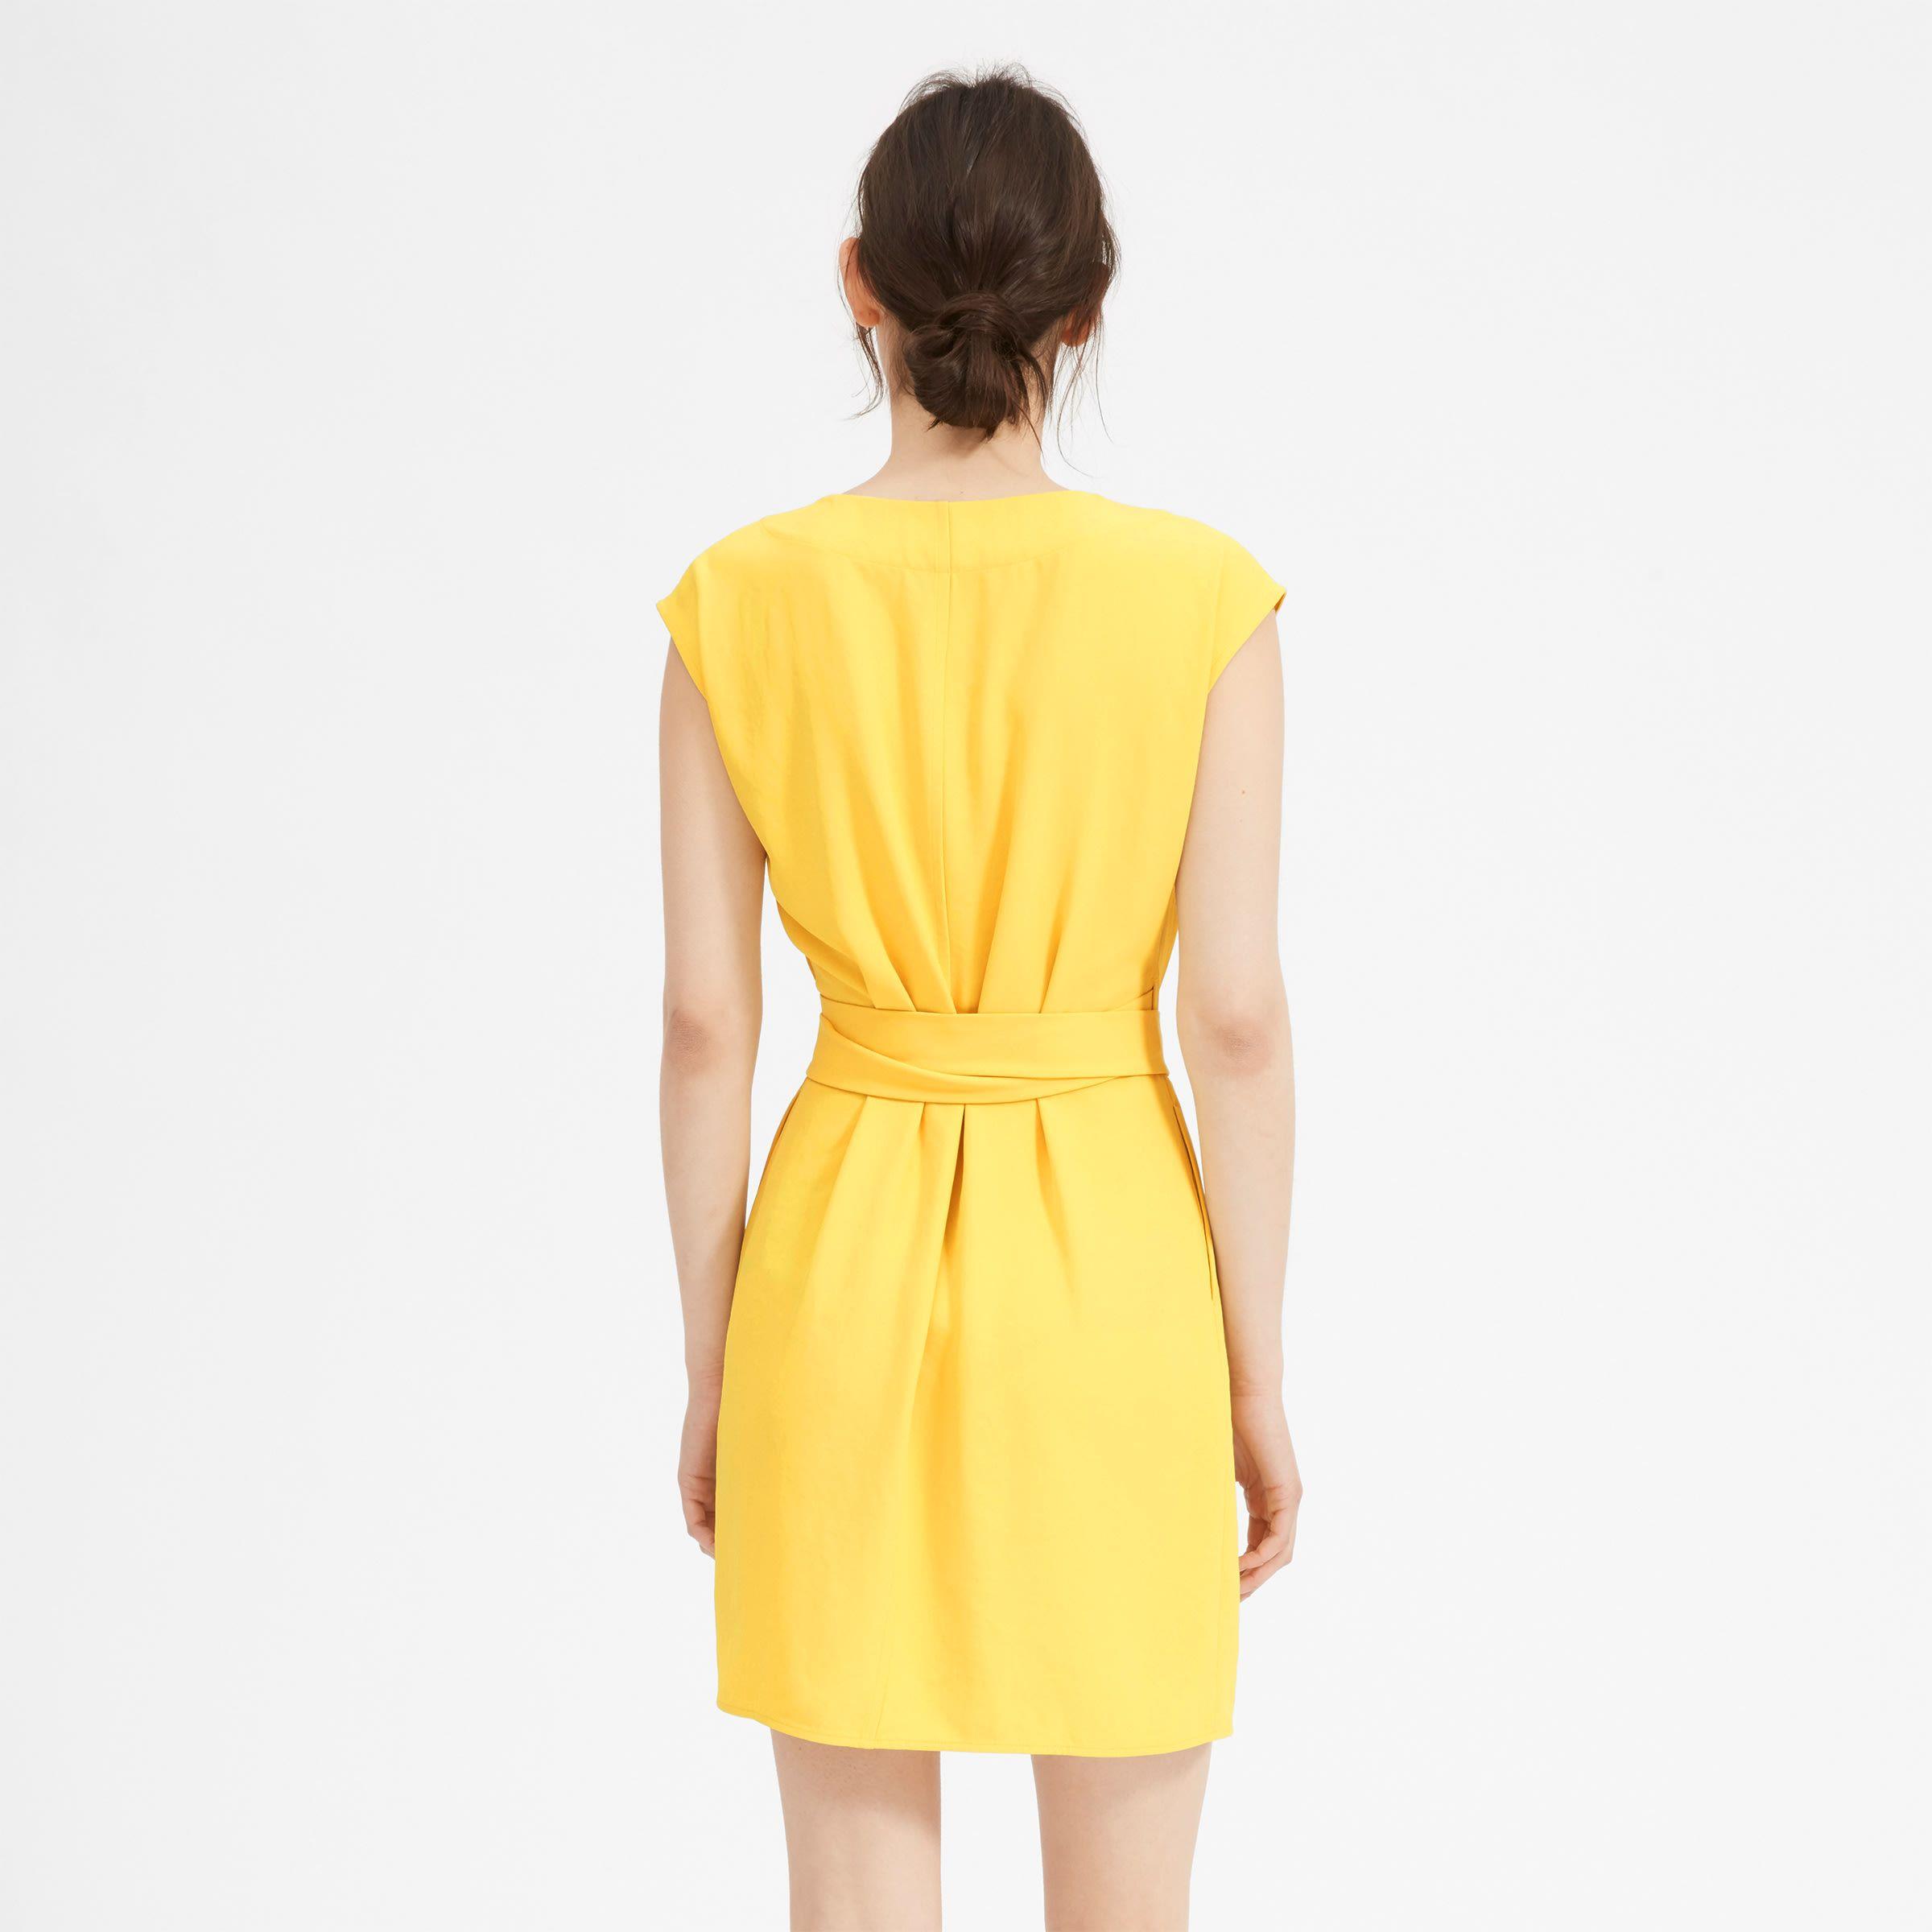 Women S Japanese Goweave Short Sleeve Mini Wrap Dress Everlane Mini Wrap Dress Cotton Tank Dress Jumpsuit Dress [ 2400 x 2400 Pixel ]